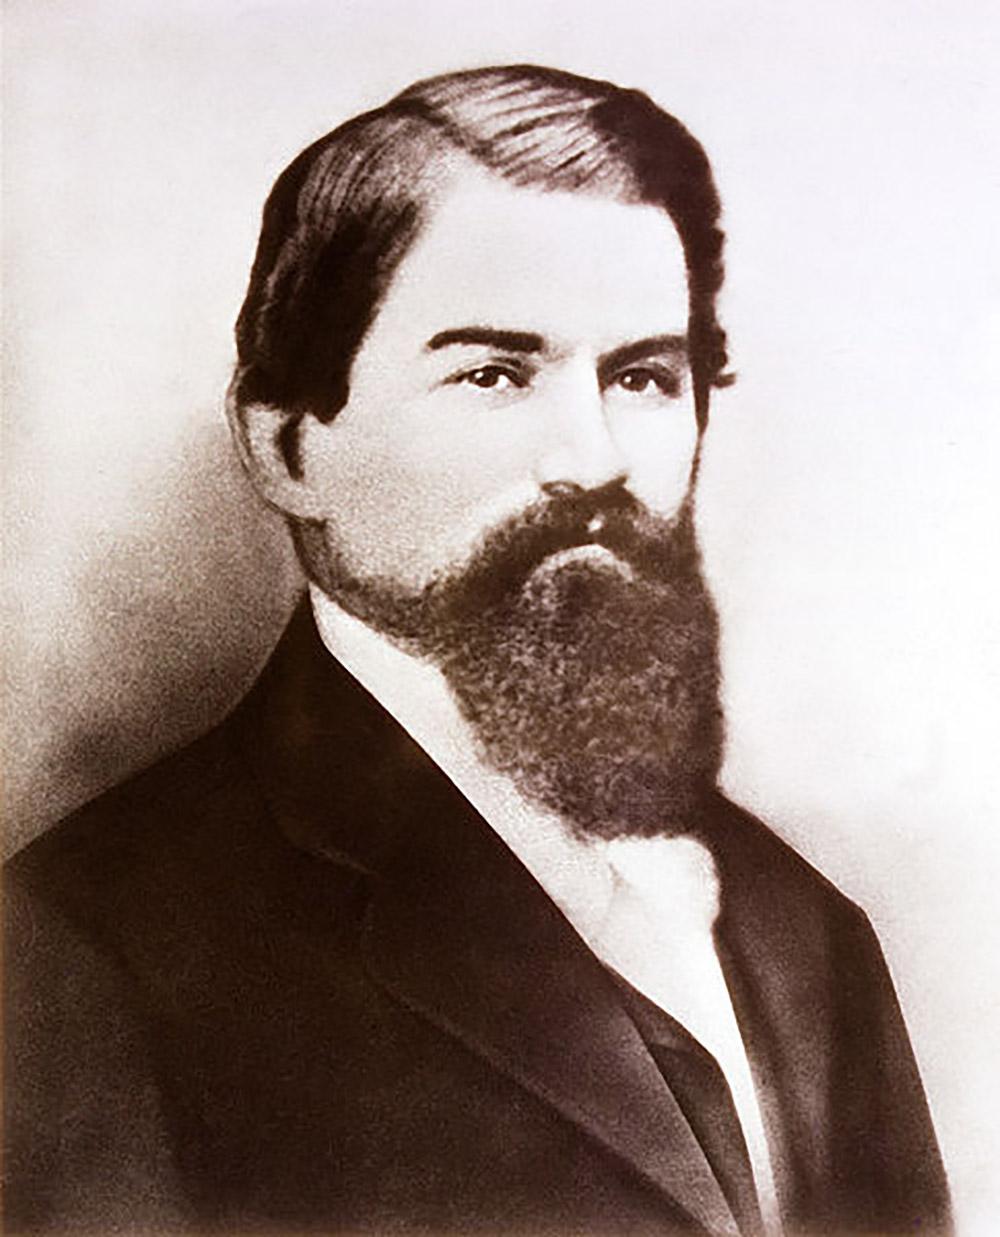 John Stith Pemberton, inventor of Coca-Cola